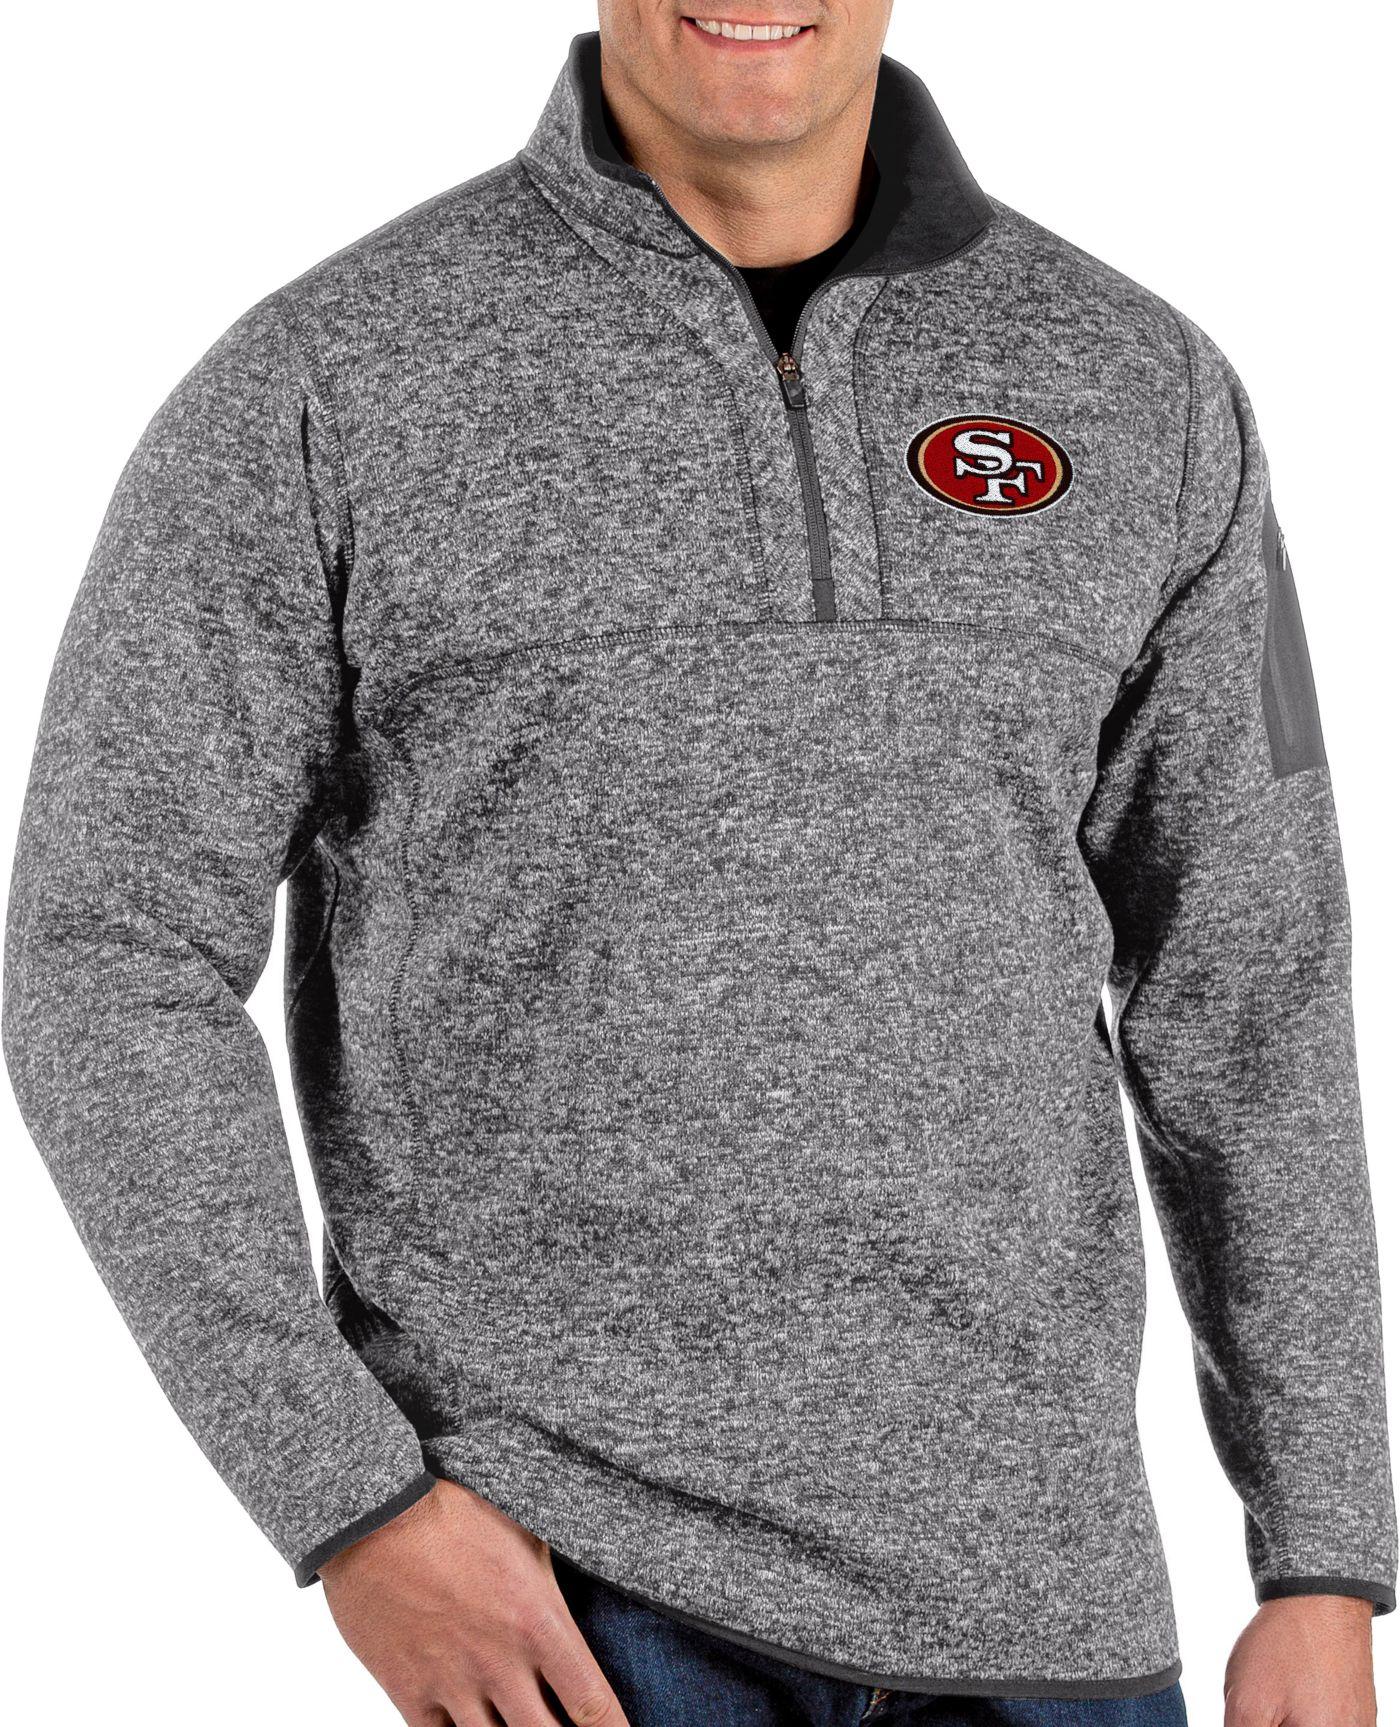 Antigua Men's San Francisco 49ers Fortune Grey Quarter-Zip Pullover